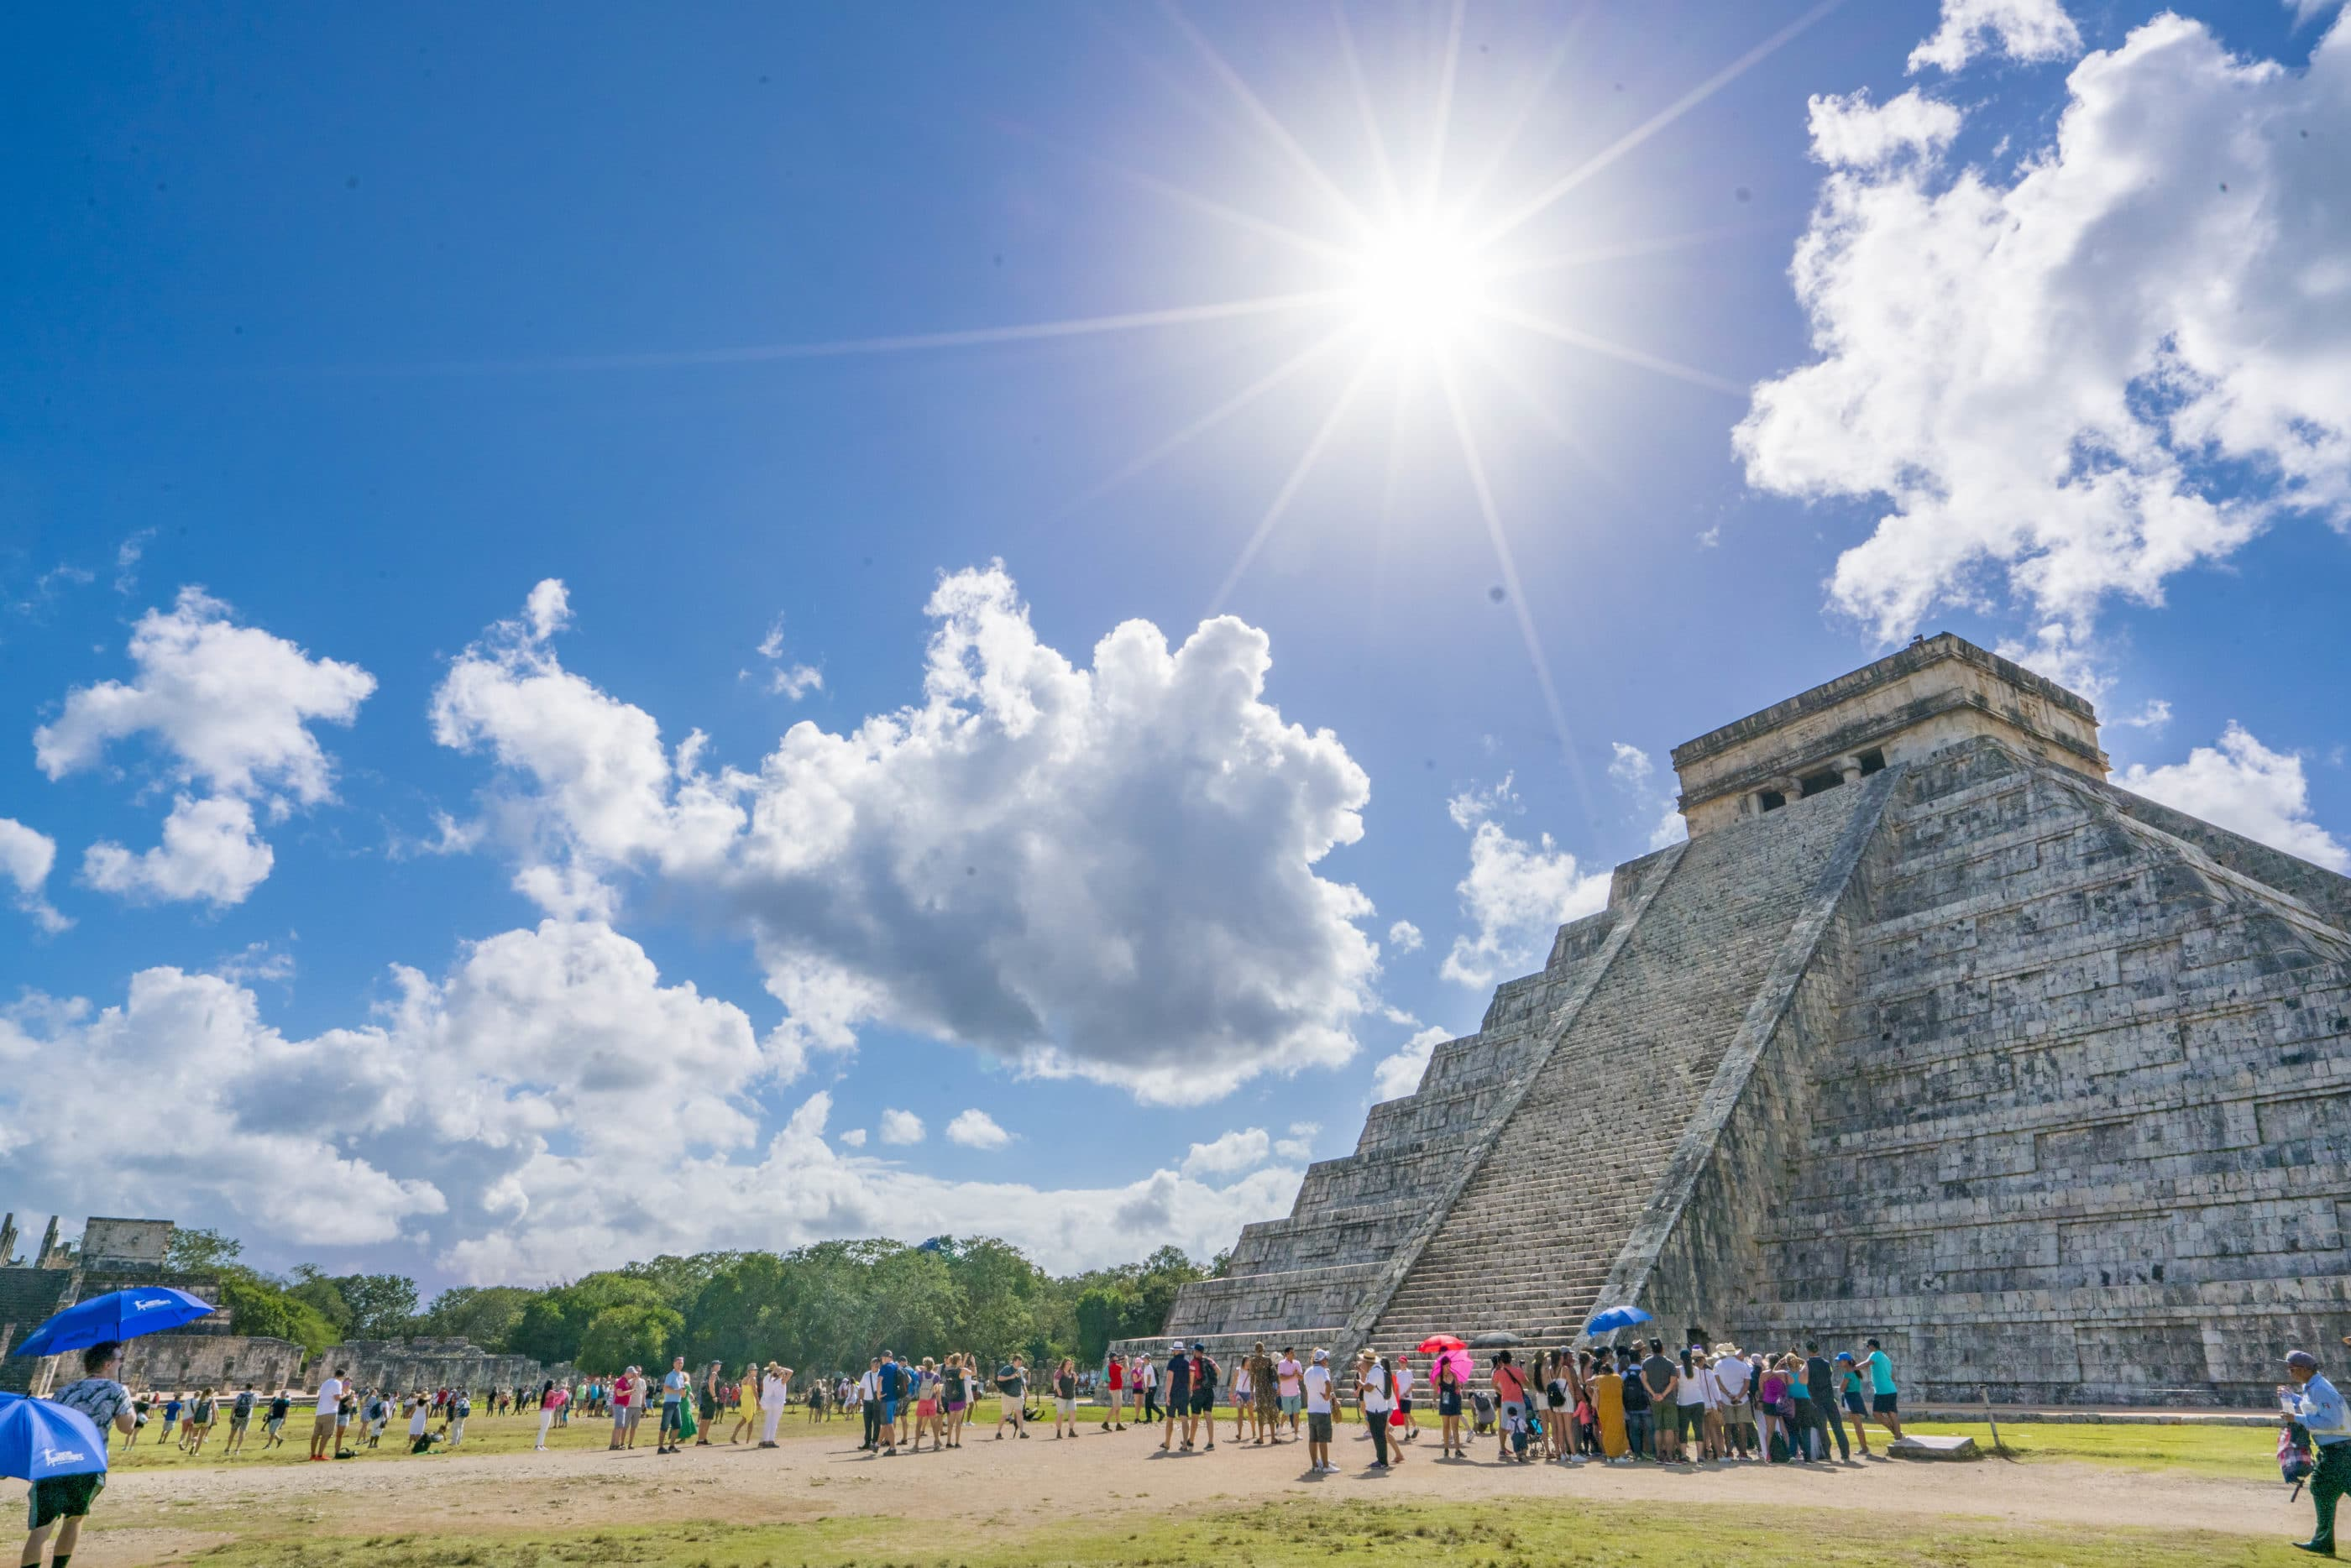 Main pyramid at Chichen-Itza under sunshine and blue skies